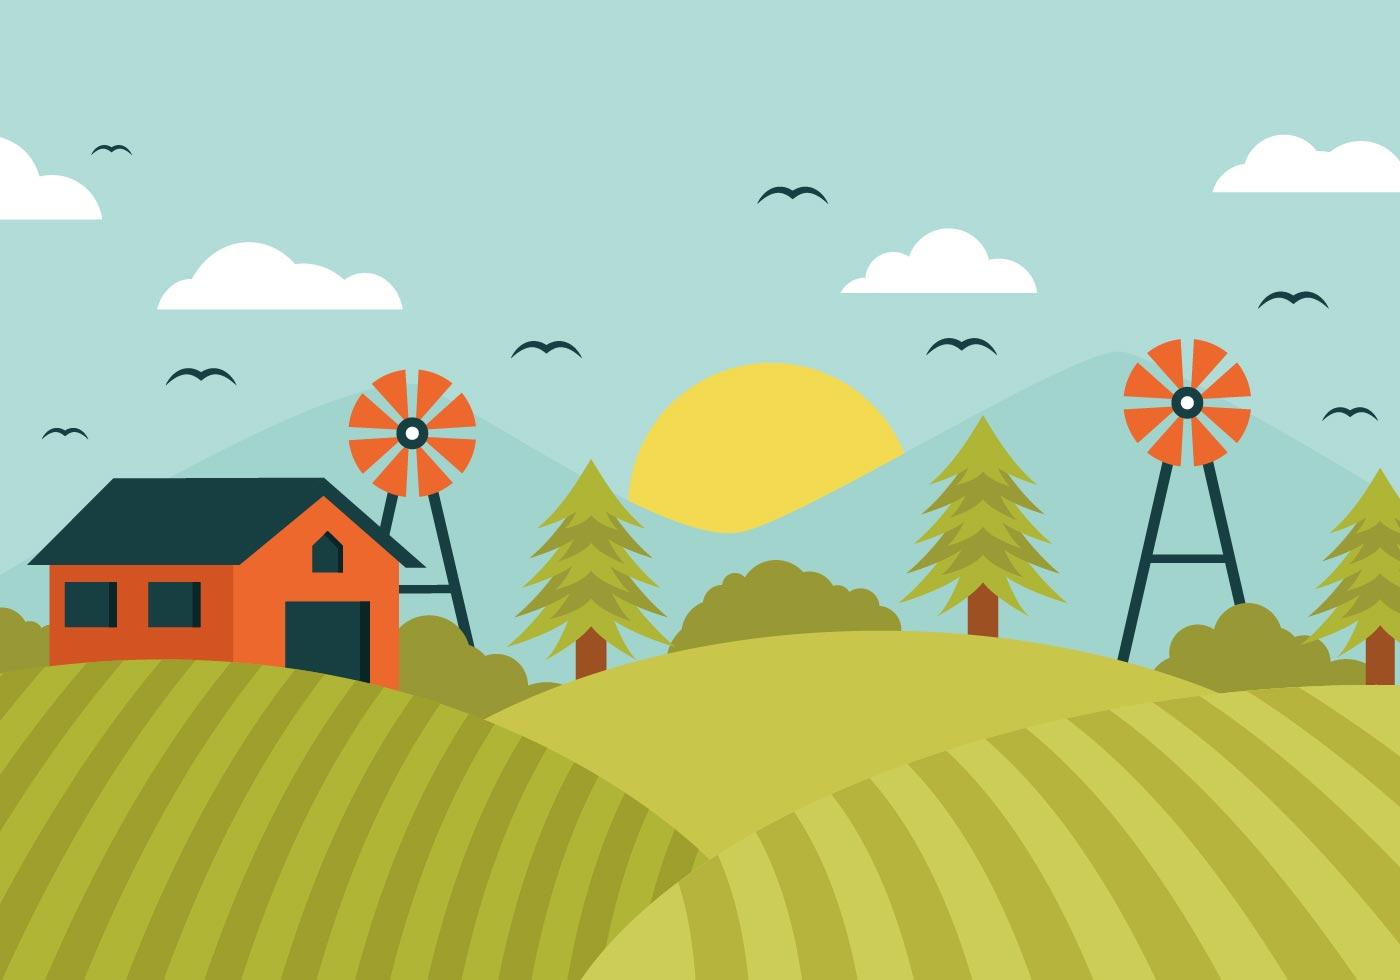 Free clipart of farmers in the fields. Farm vector art downloads